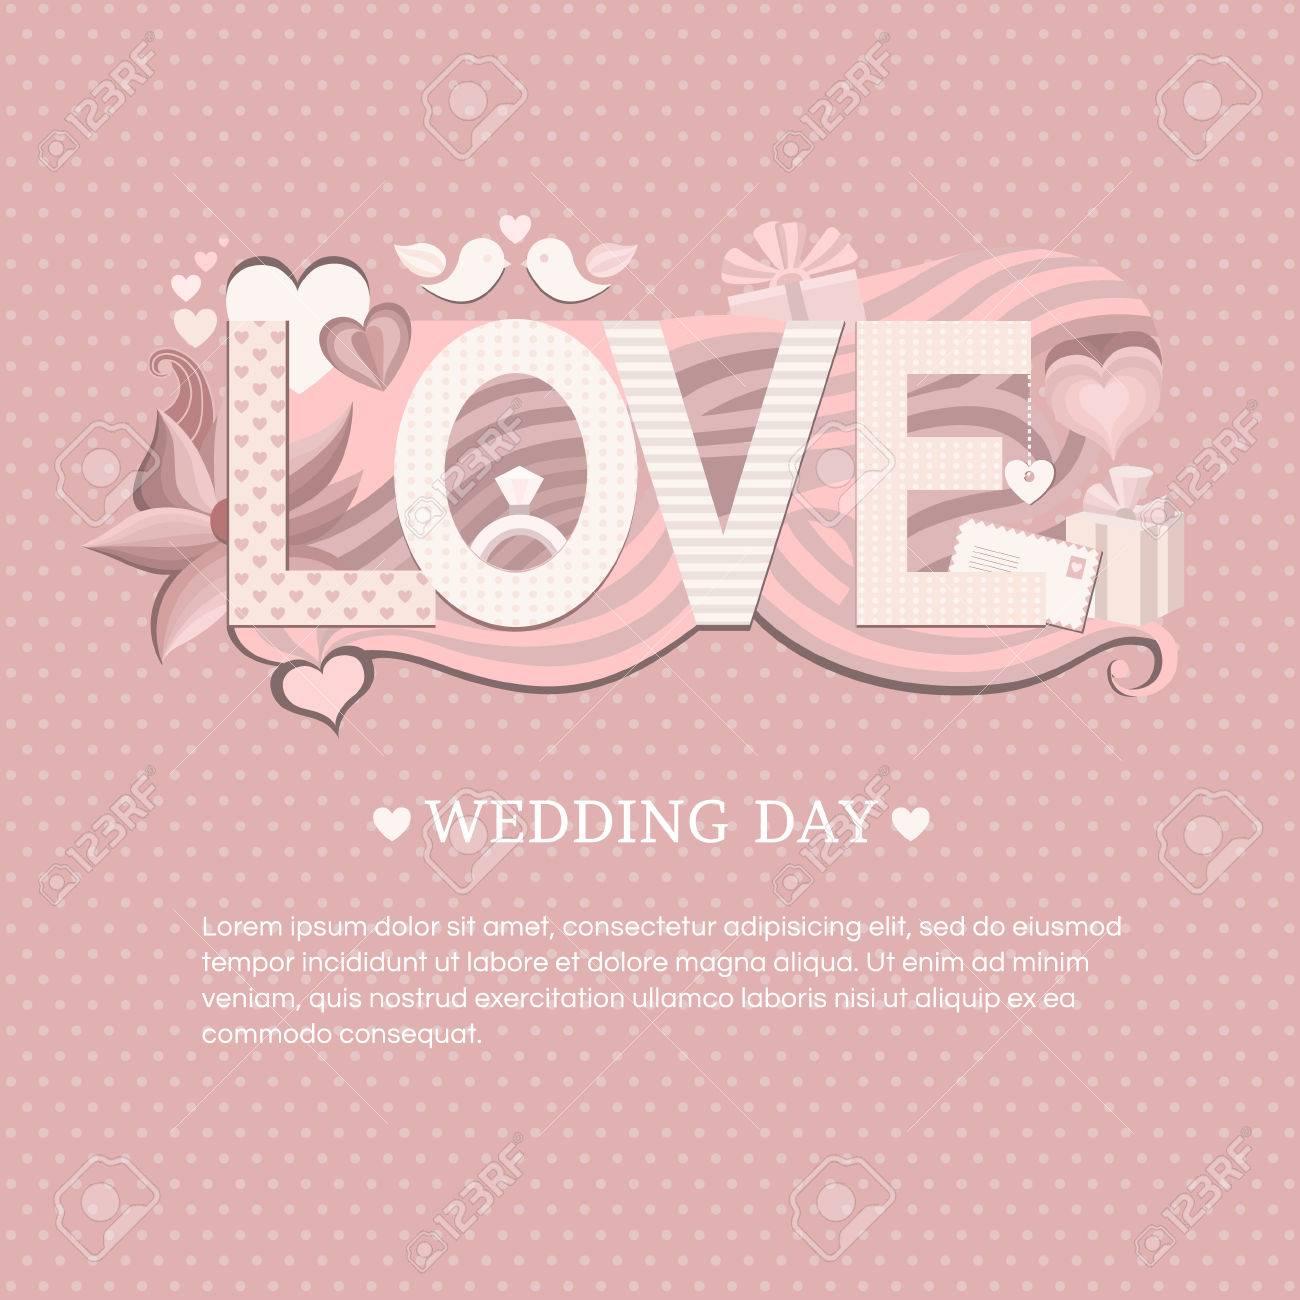 Banner wedding day wedding invitation card save the date card wedding invitation card save the date card stock vector stopboris Image collections